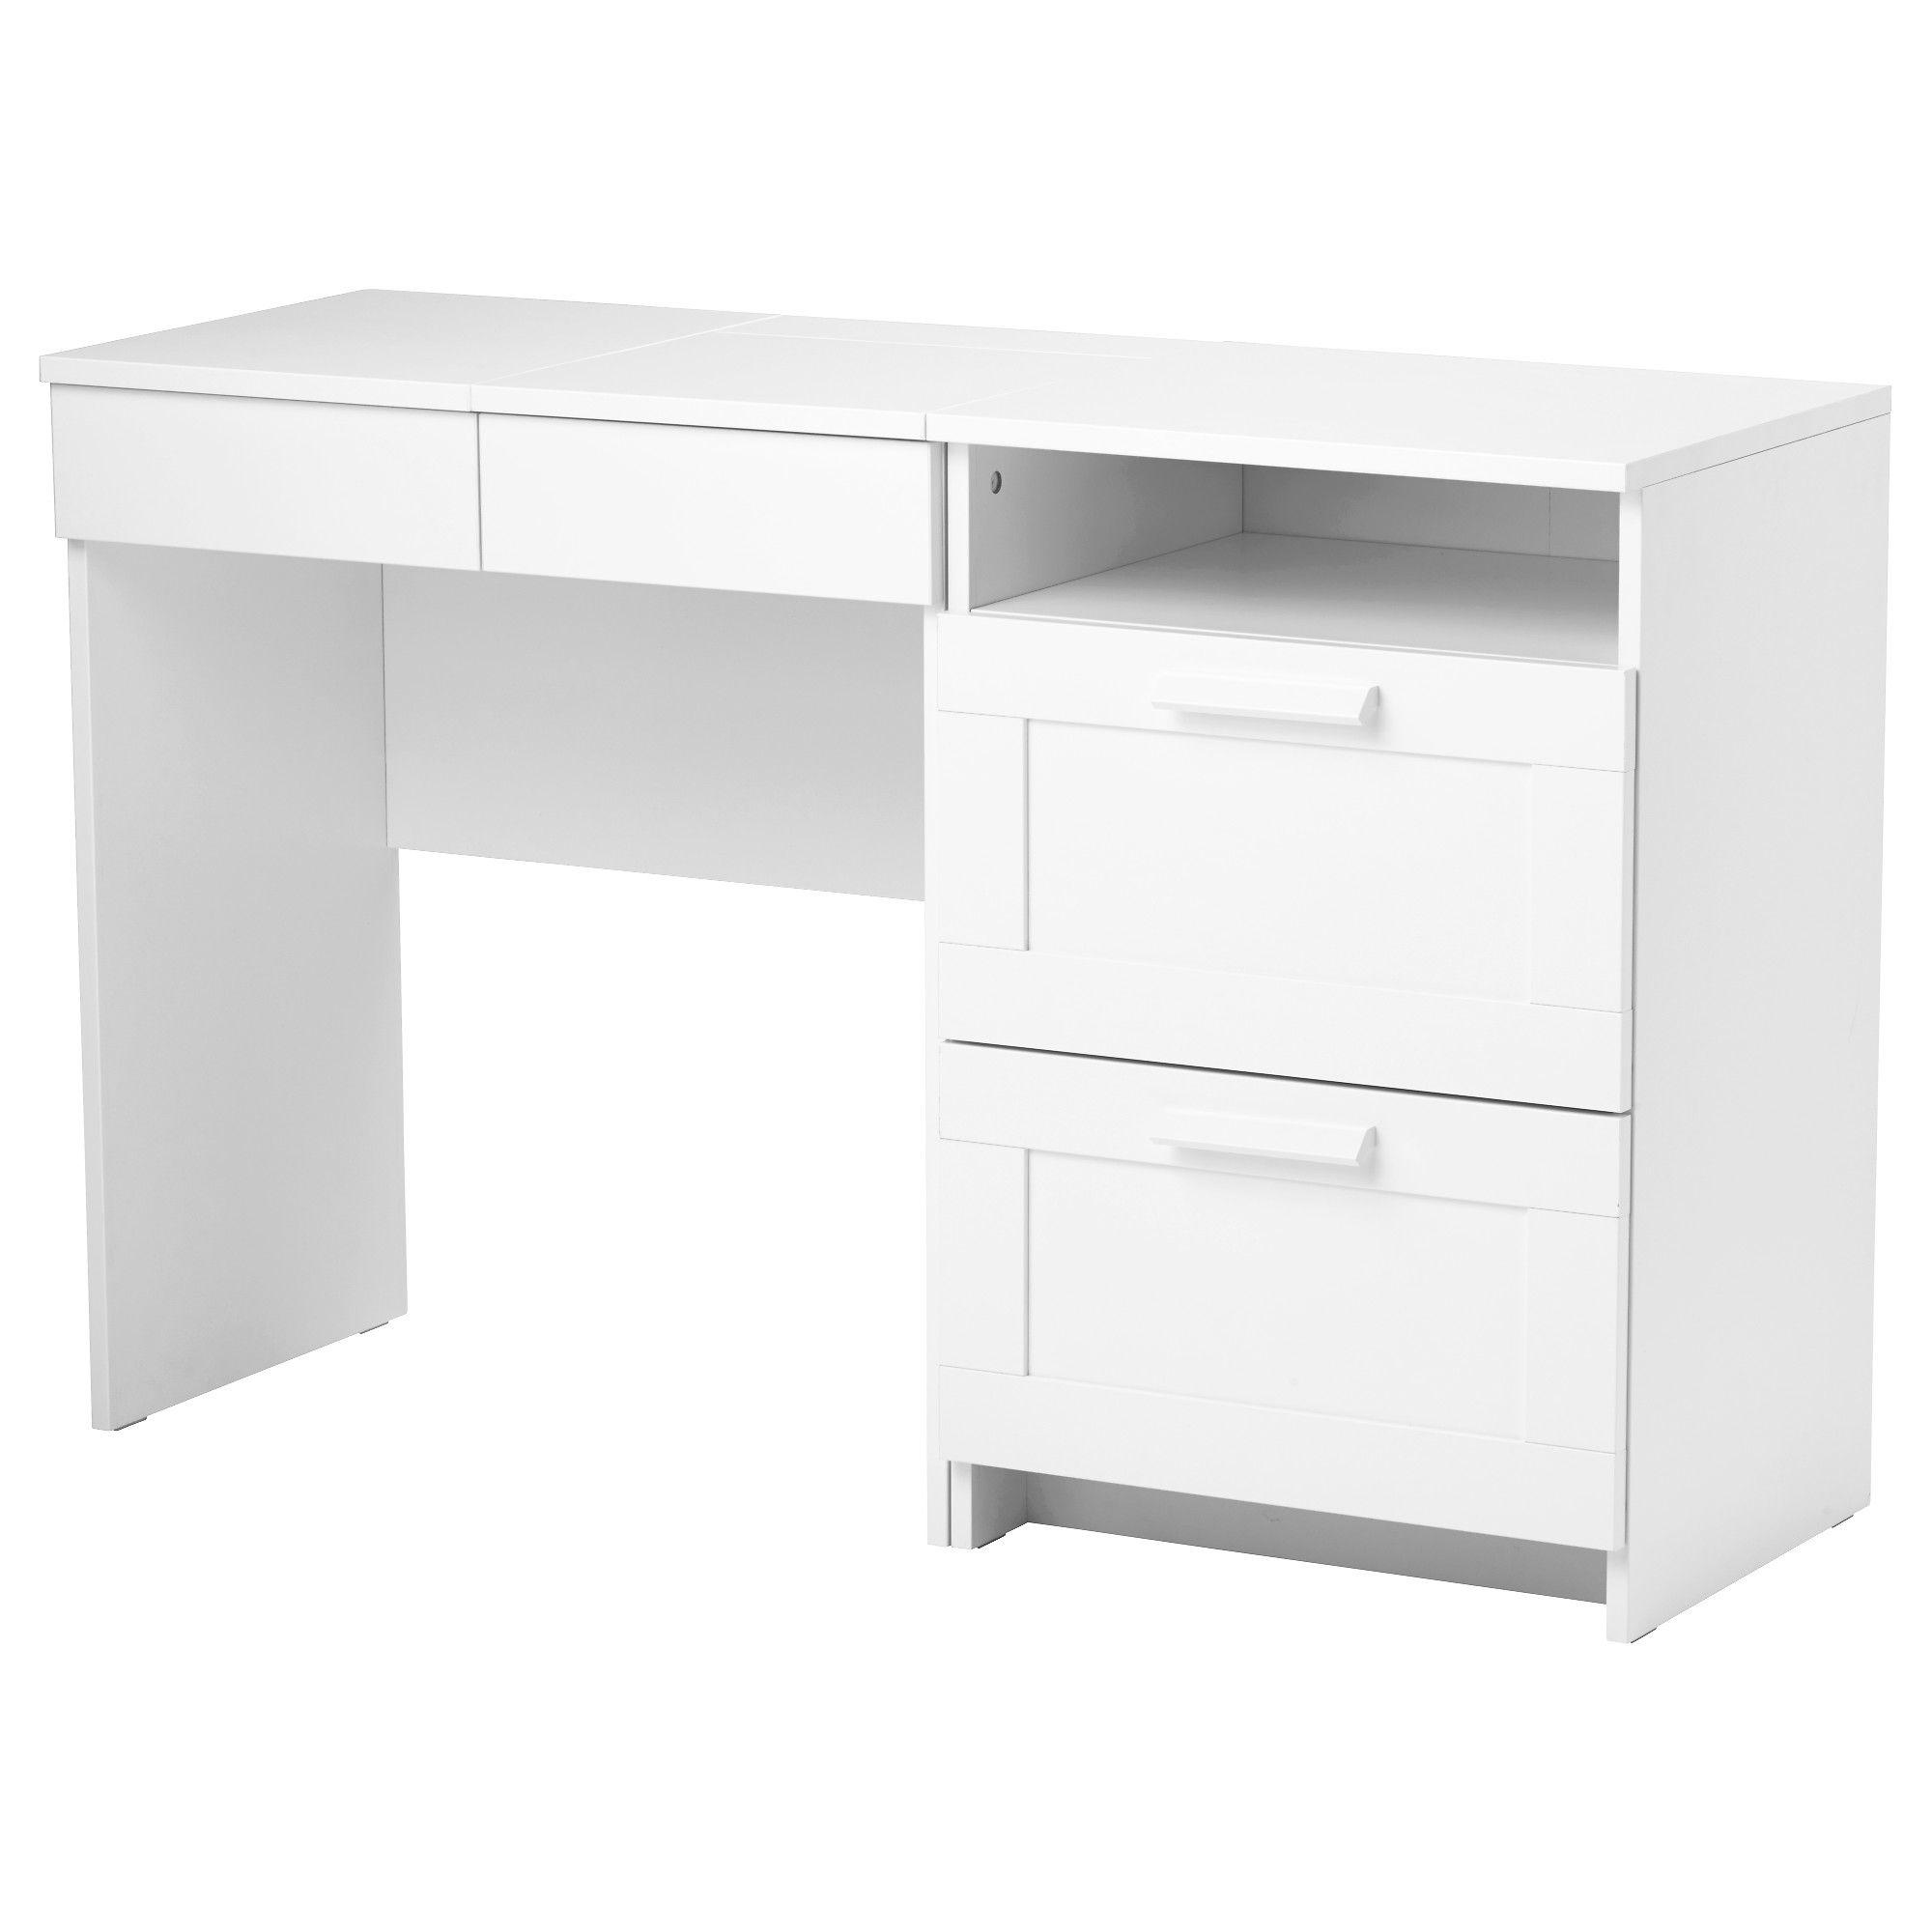 Shop For Furniture Home Accessories More Brimnes Dressing